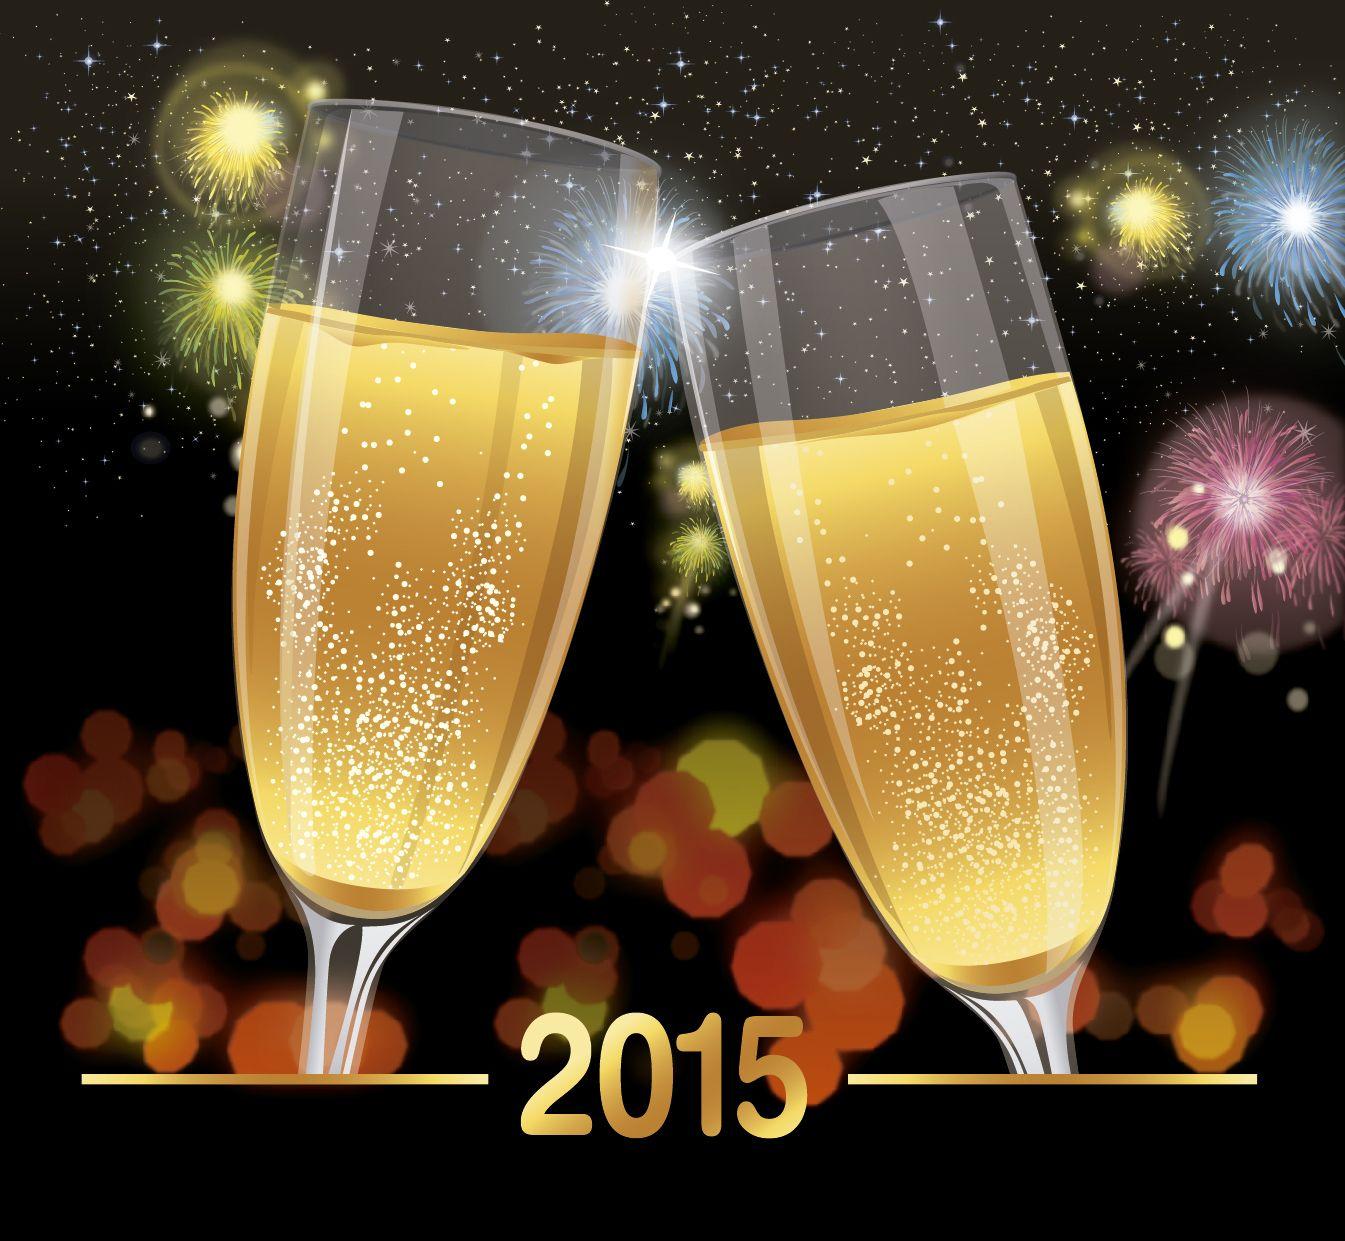 Fondo de brindis de celebraci?n 2015